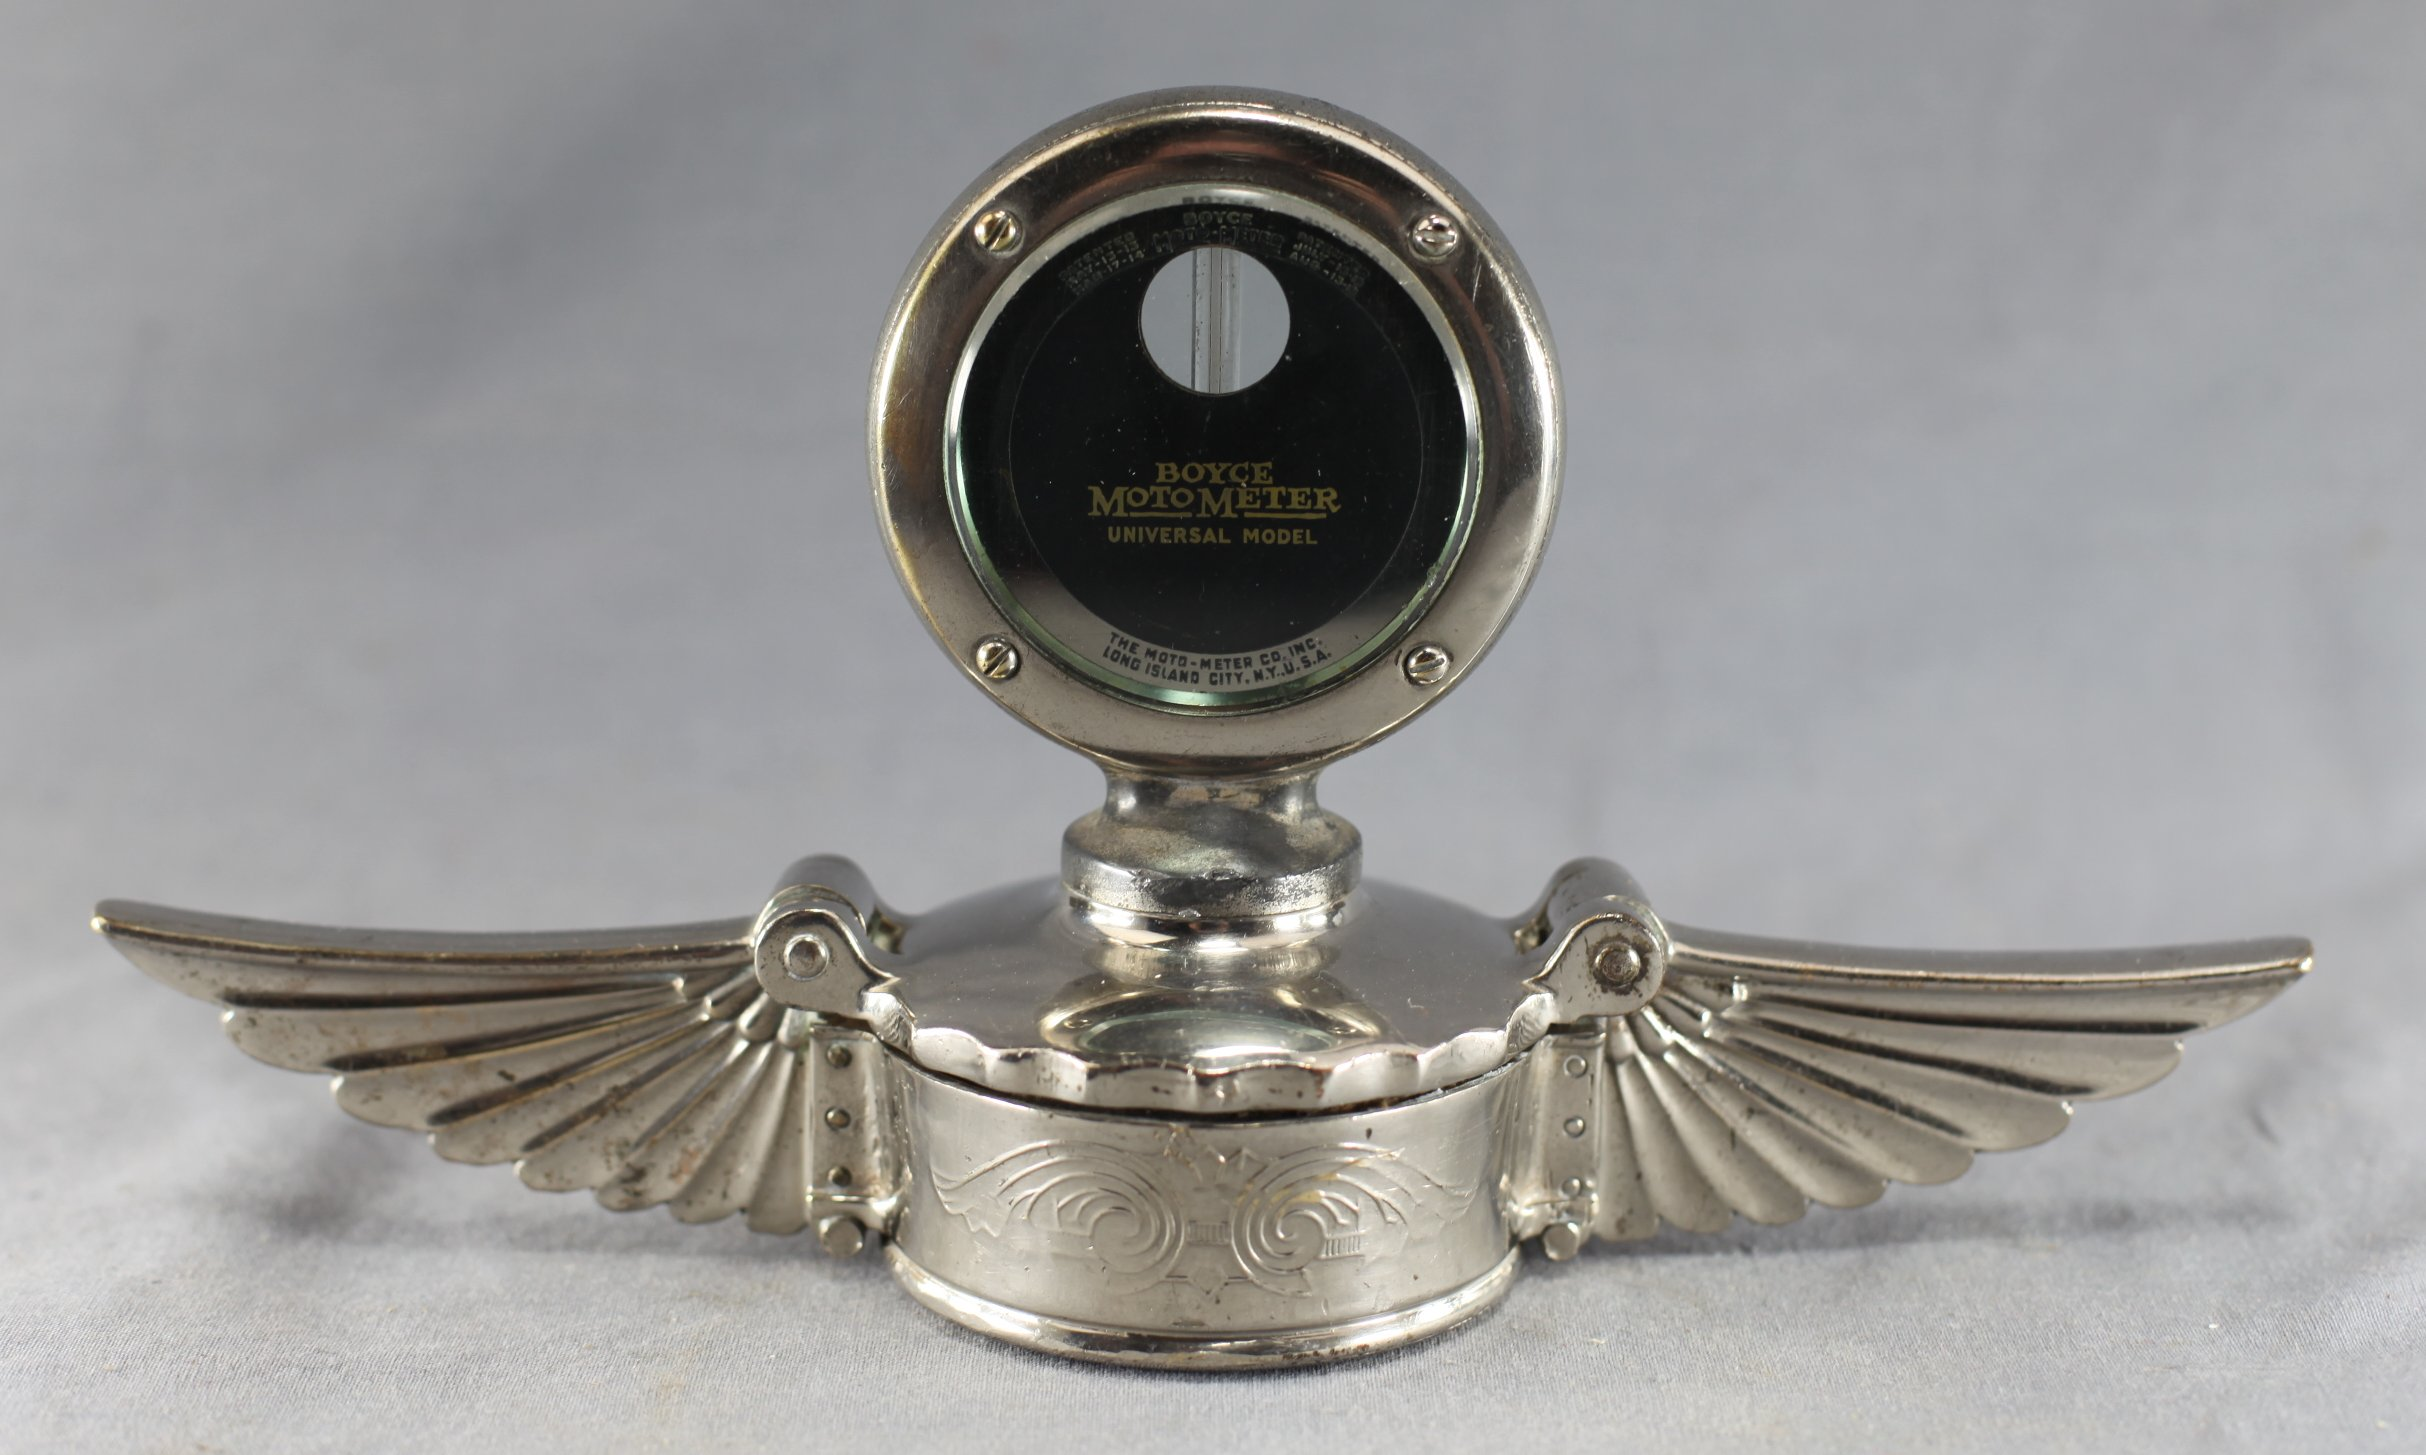 Hinged-Cap Winged Motometer